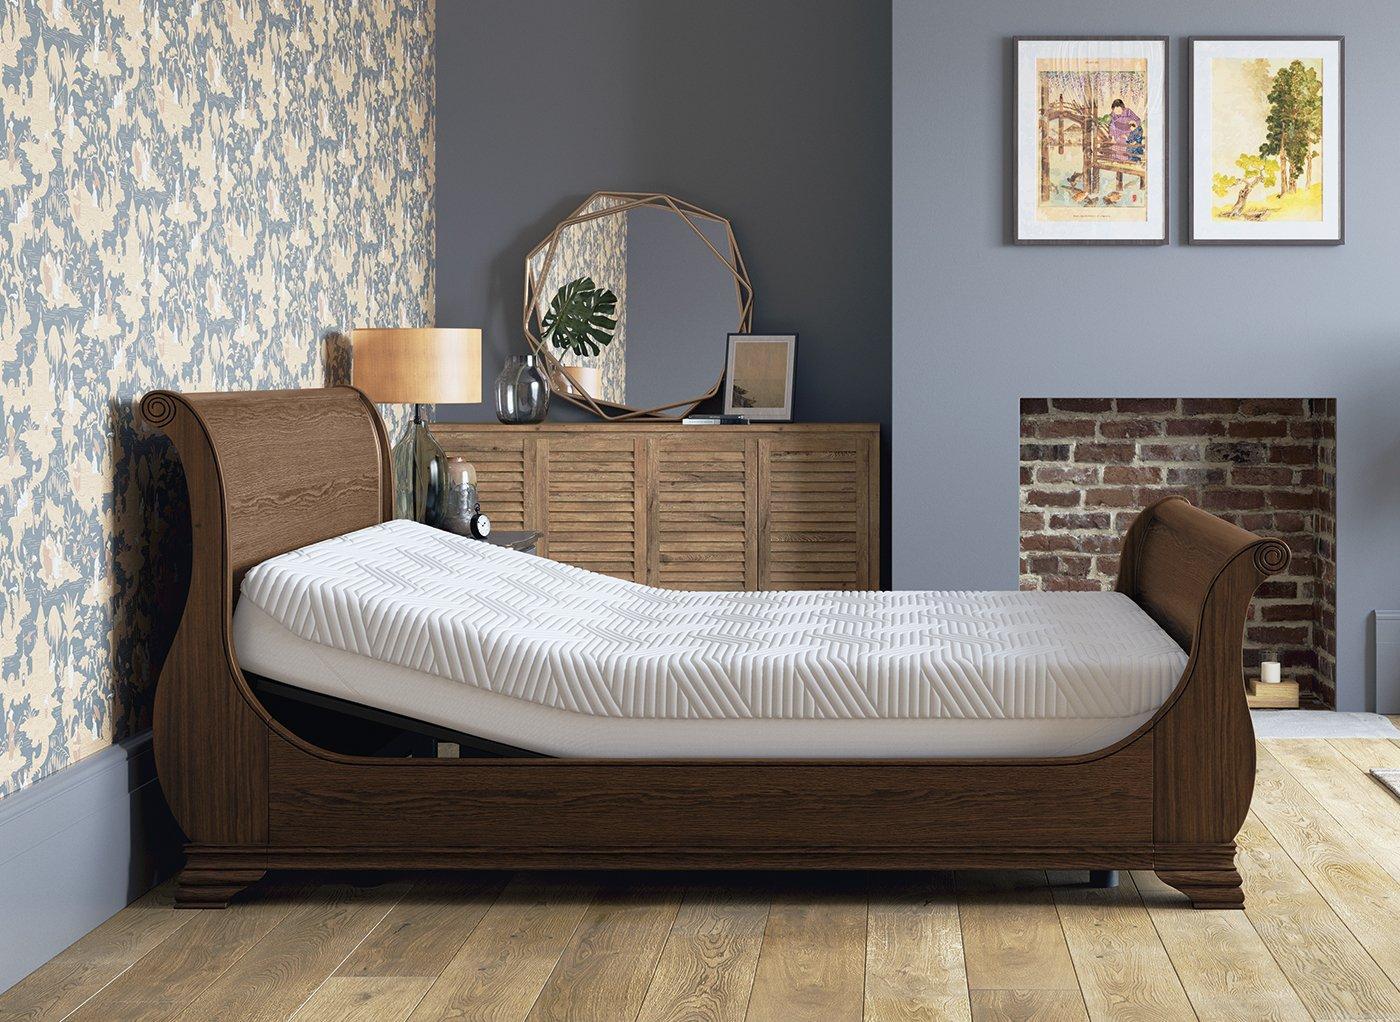 Otis Sleepmotion Adjustable Wooden Bed Frame (£1,048)